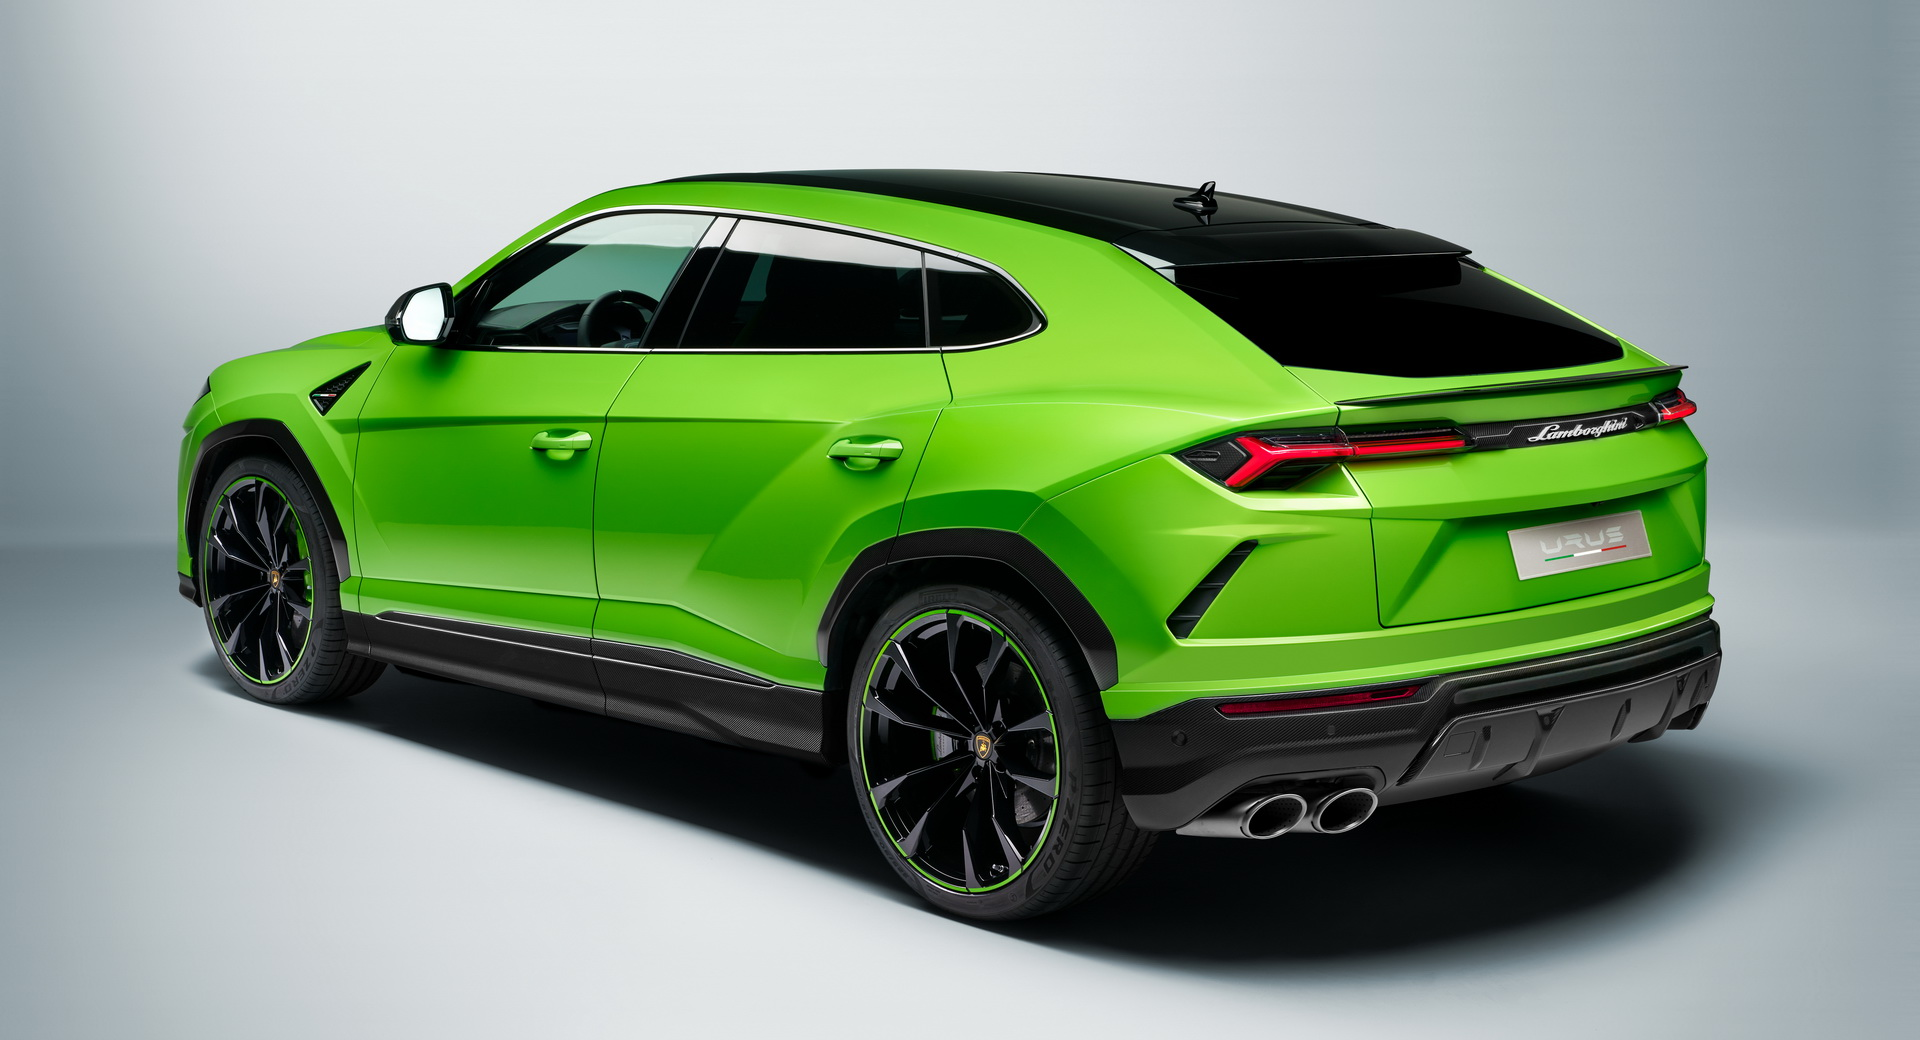 Lamborghini-Urus-Pearl-Capsule-Edition-7